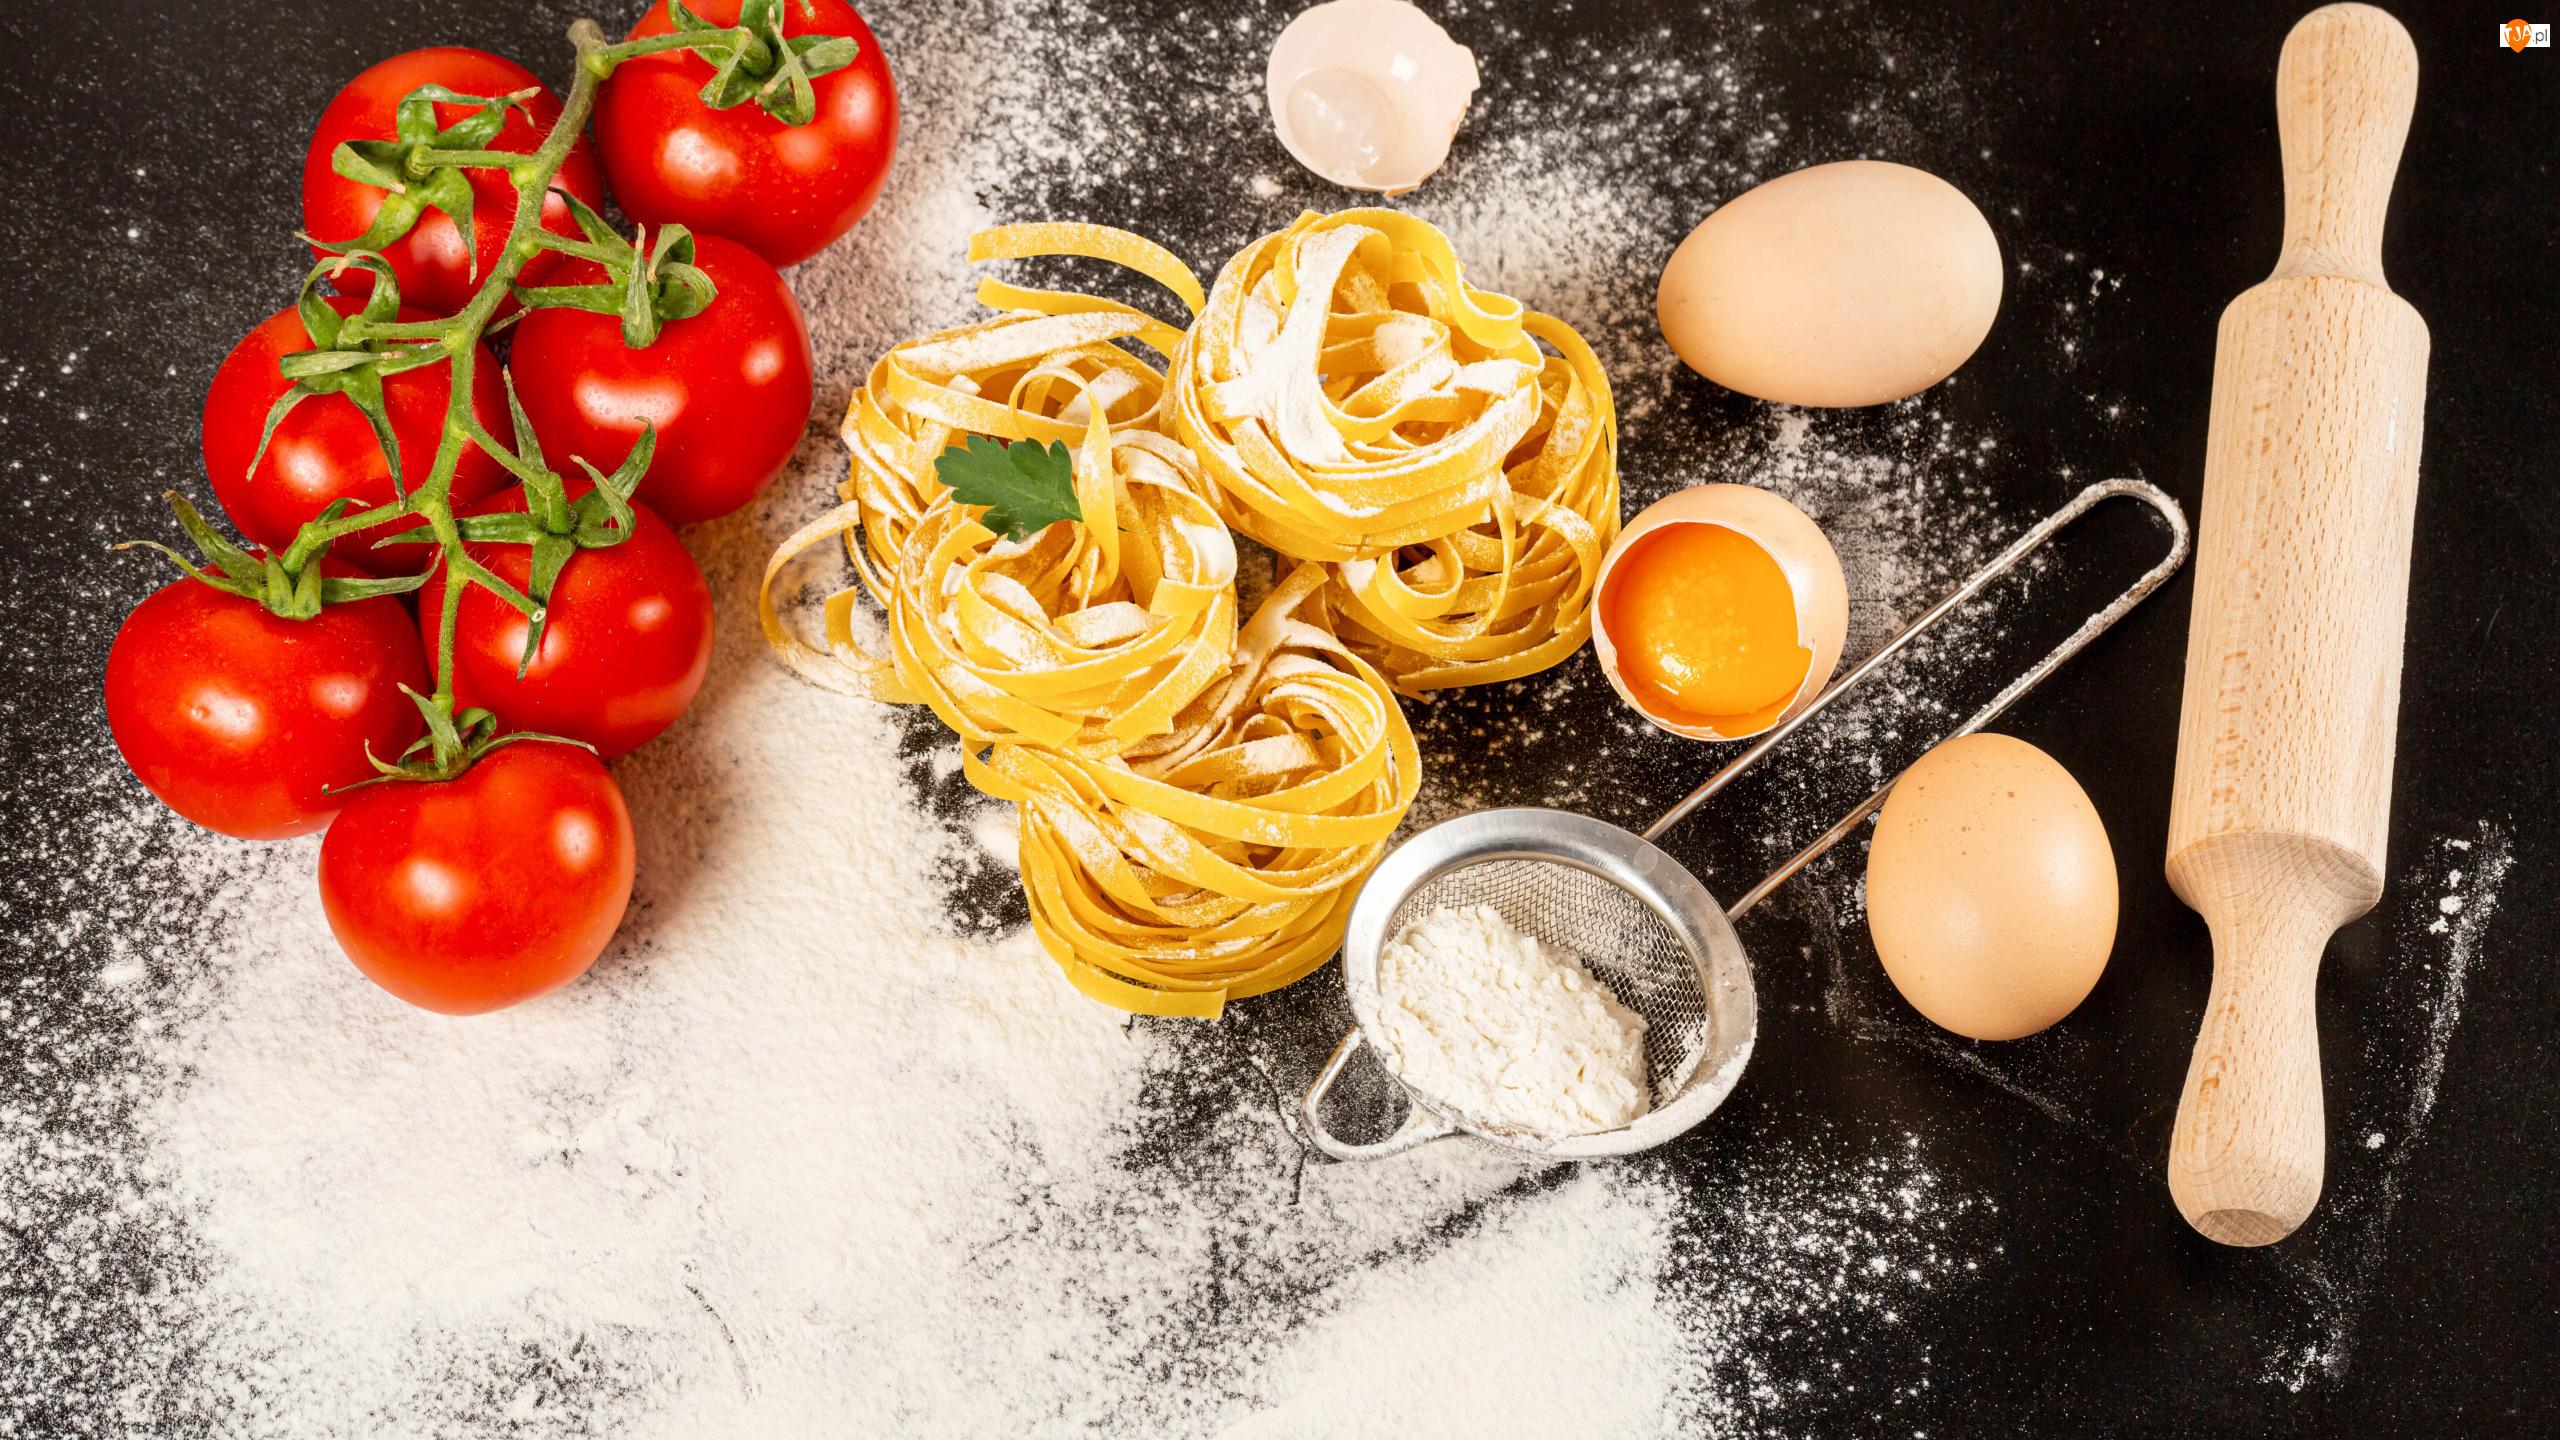 Jajka, Wałek, Makaron, Pomidory, Mąka